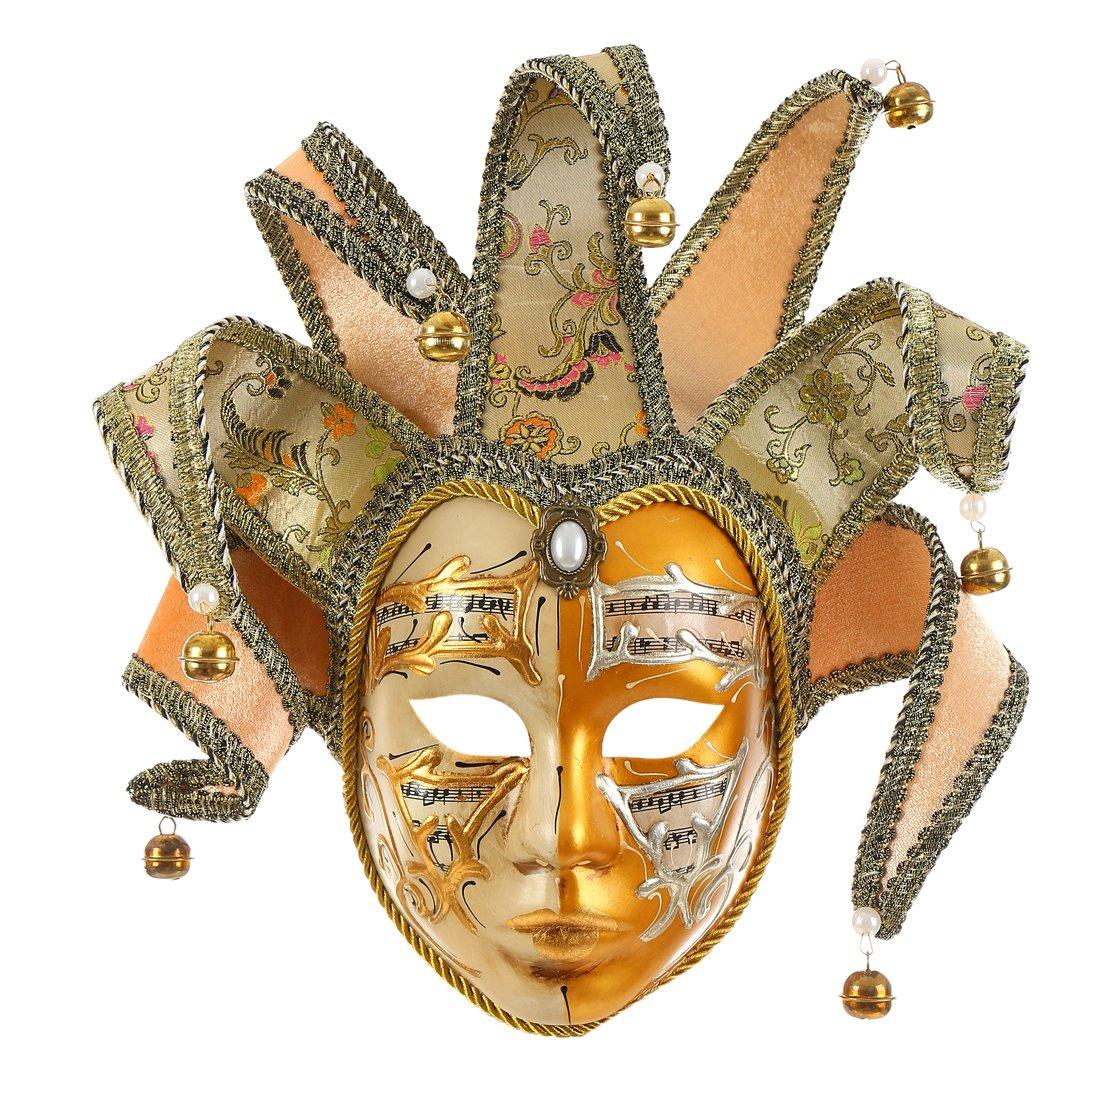 Gold Volto Resin Music Venetian Jester Mask Full Face Masquerade Bell Joker Wall Decorative Art Collection by Hophen